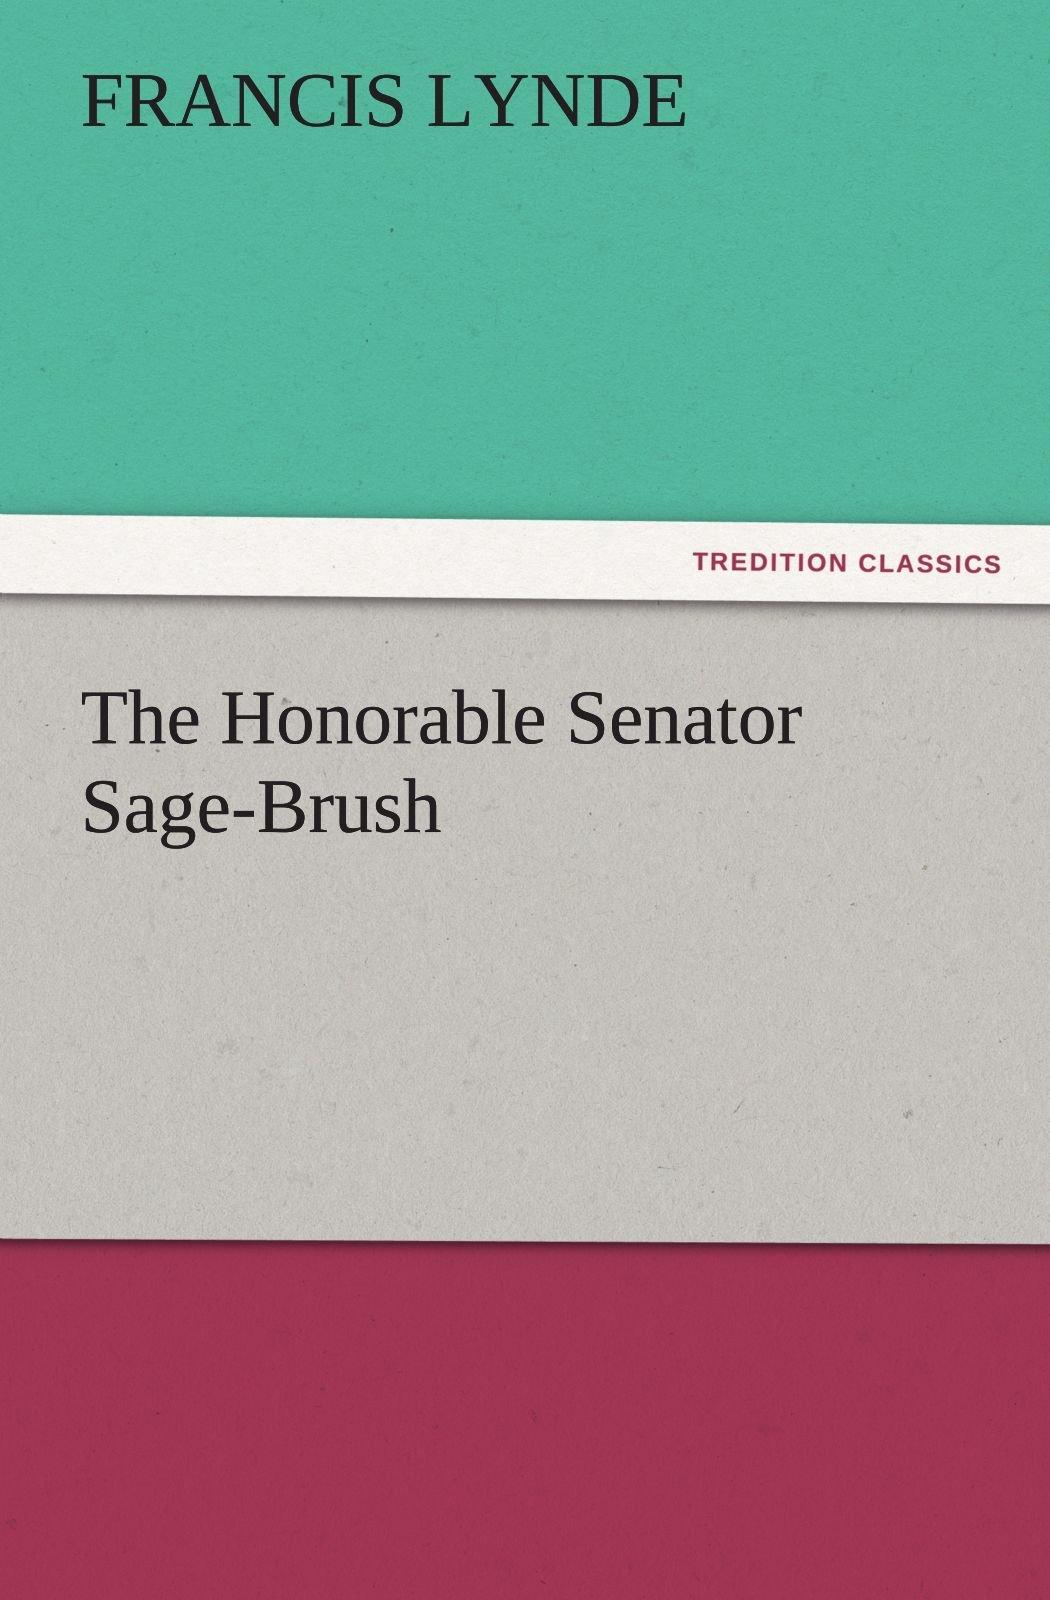 Download The Honorable Senator Sage-Brush (TREDITION CLASSICS) PDF